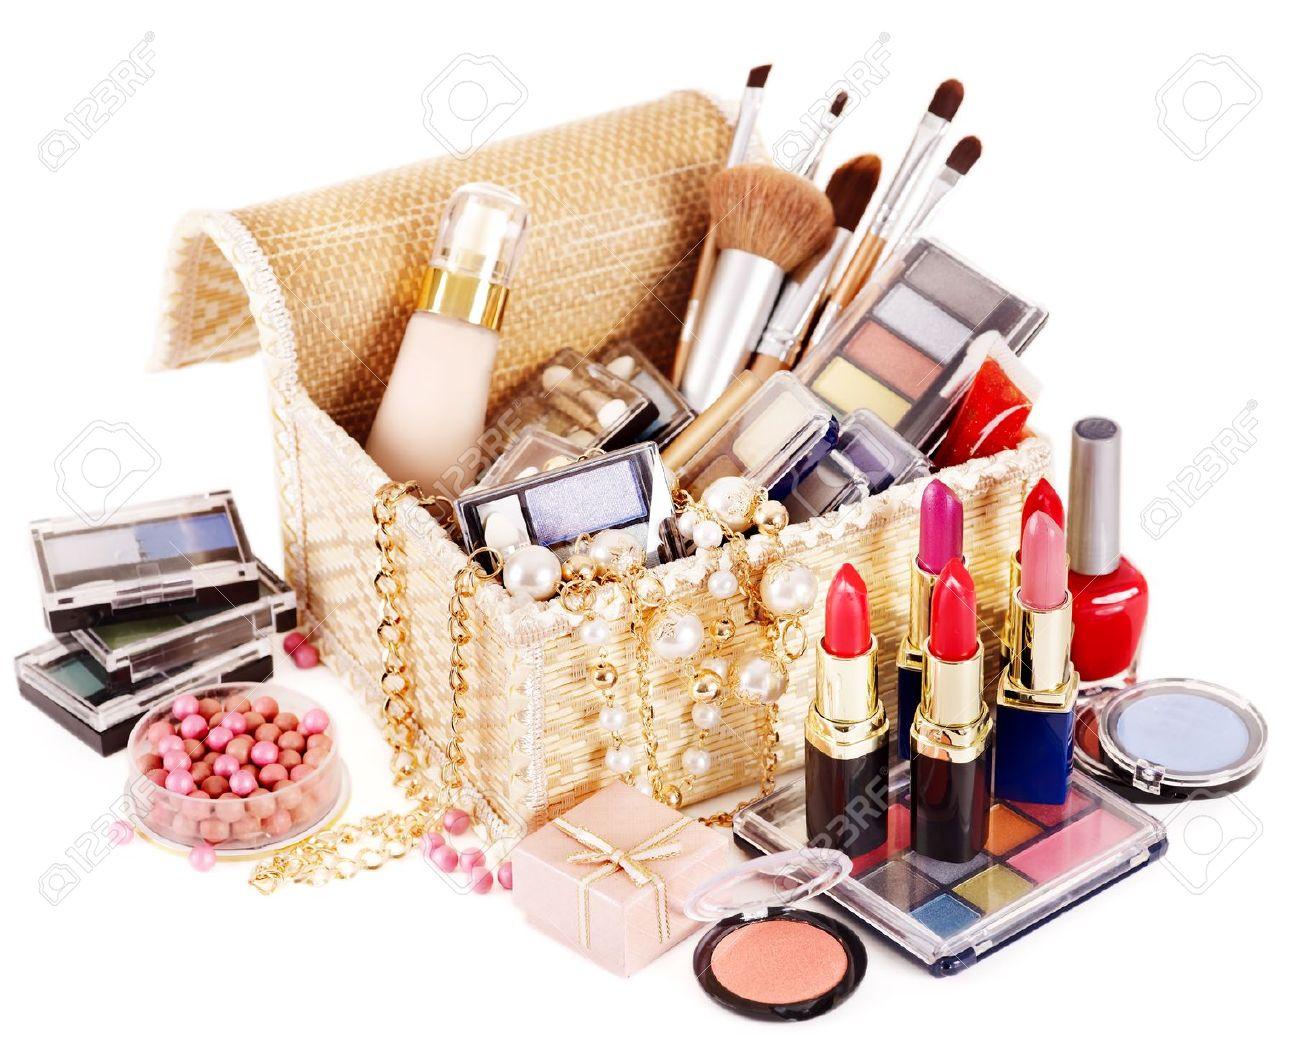 Decorative cosmetics in makeup box. Stock Photo - 13237153